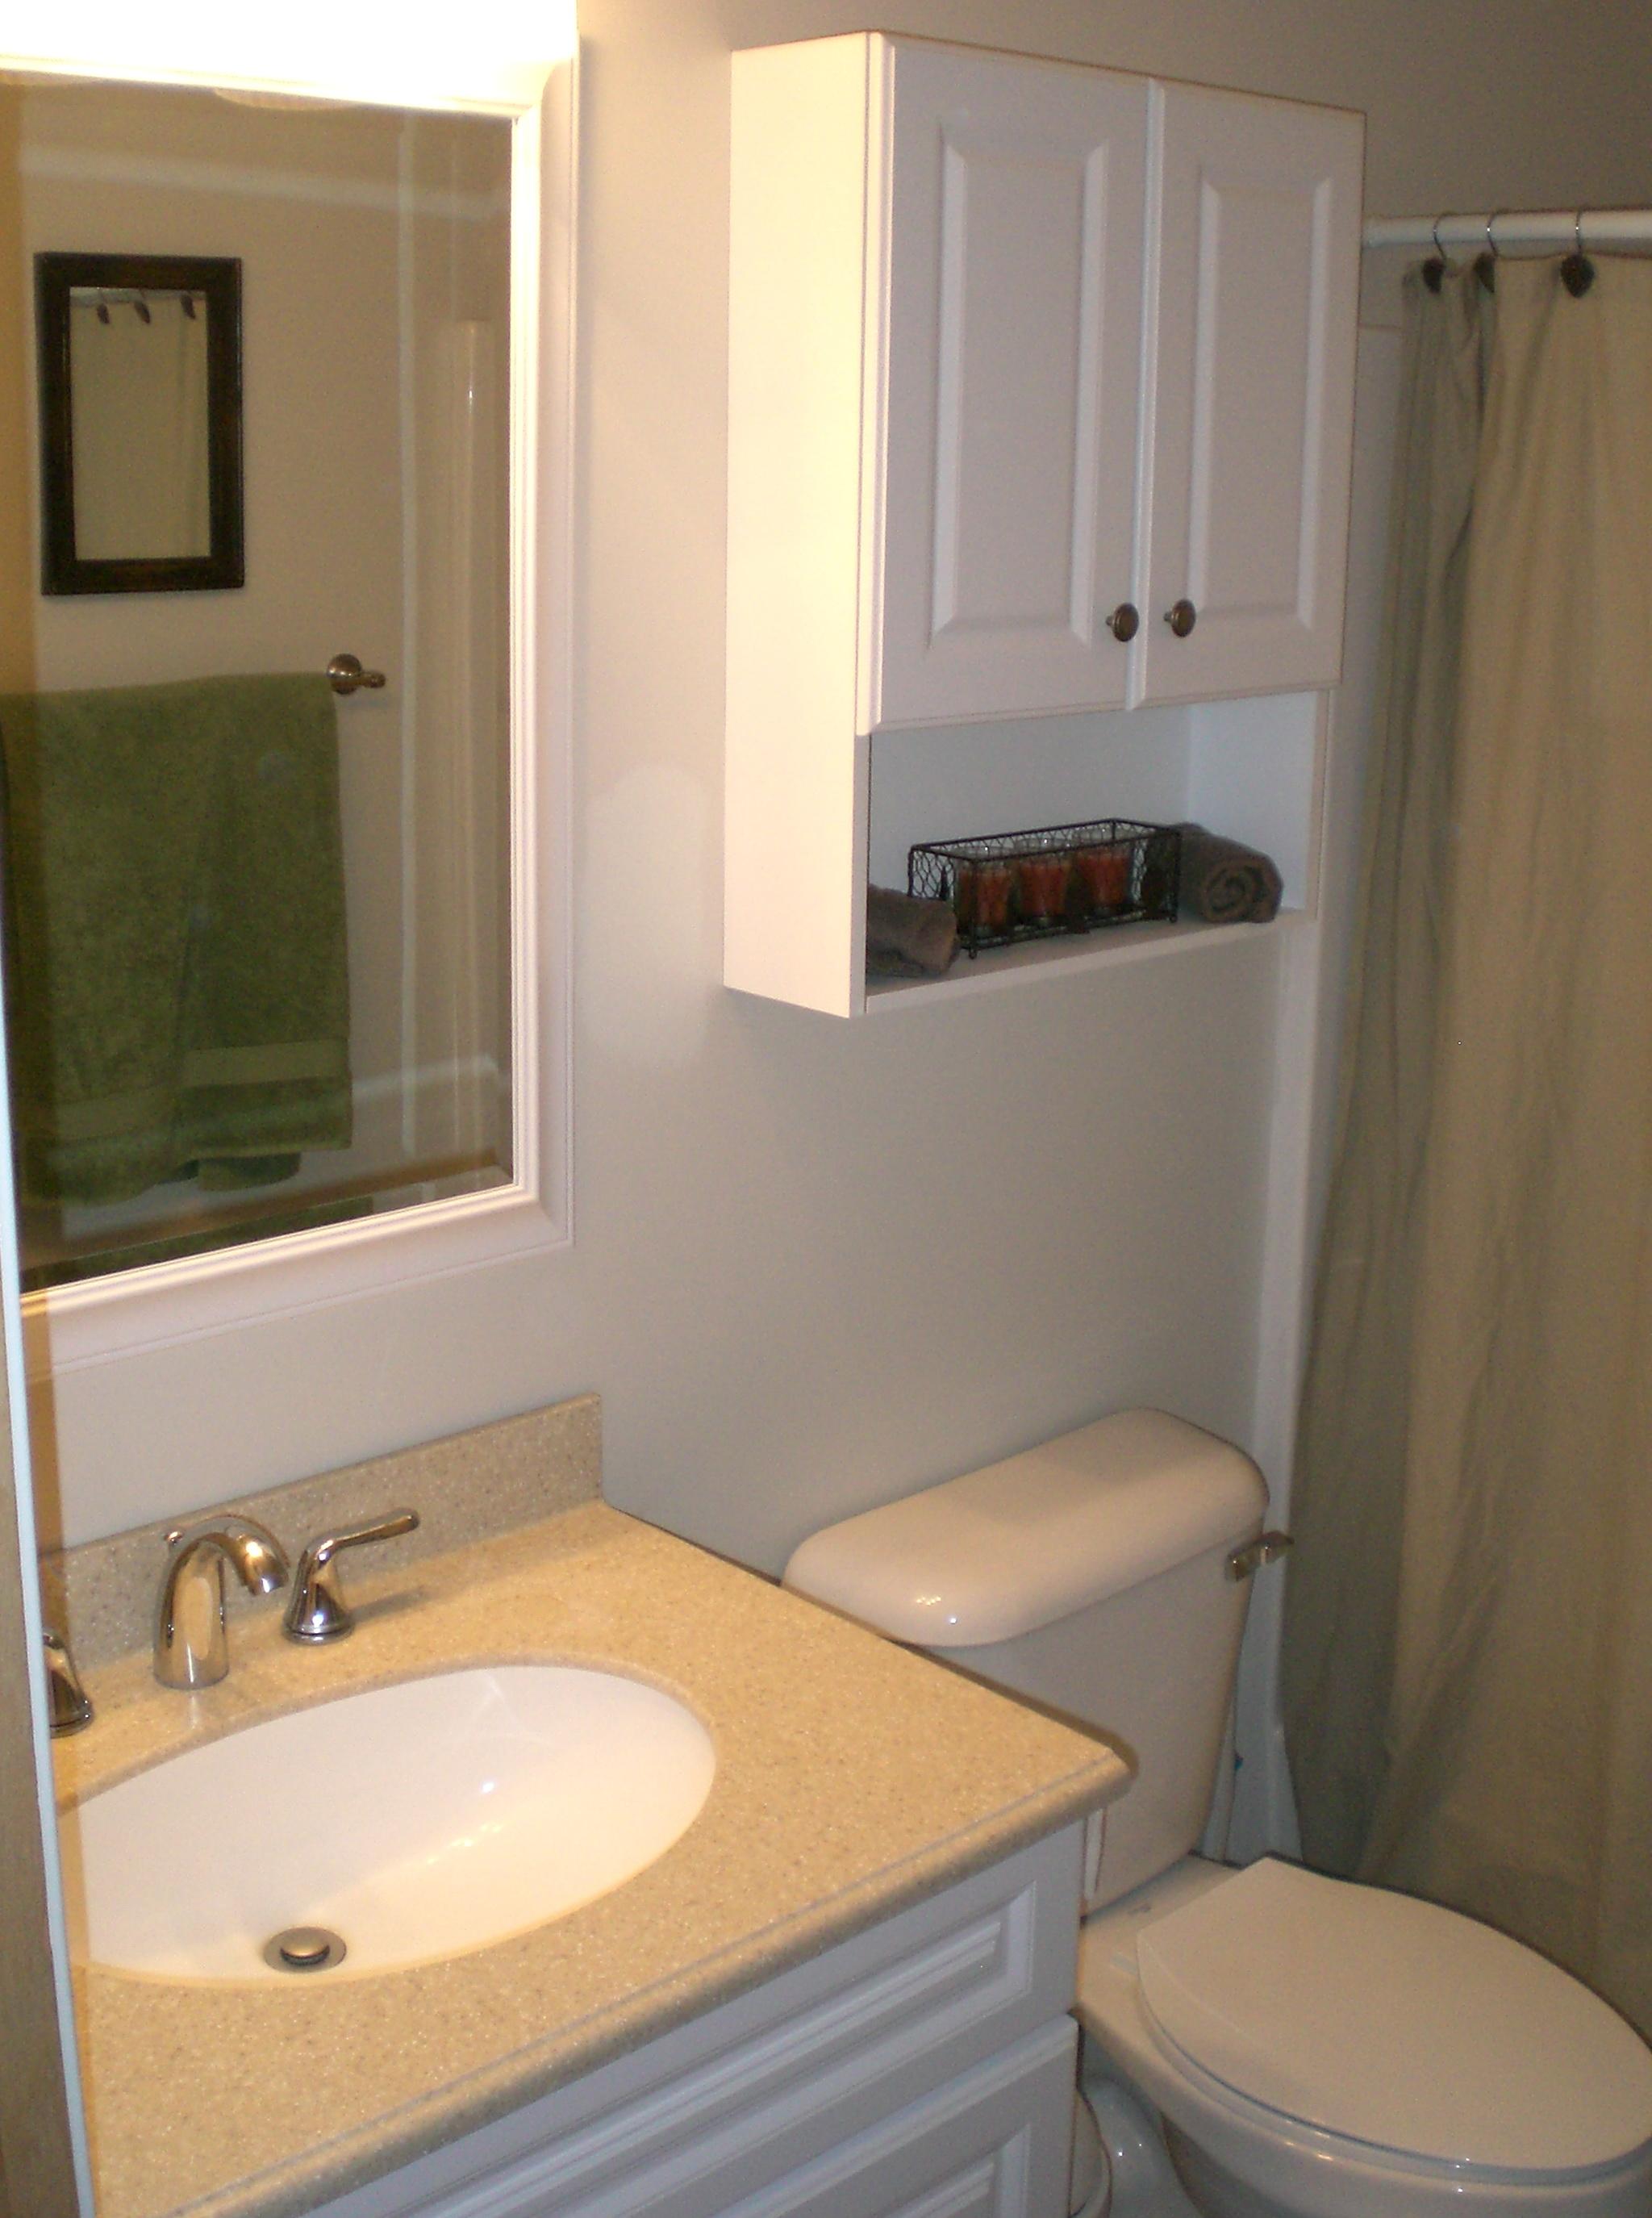 Clearance bathroom vanities vanity clearance 100 for Bathroom decor naples fl